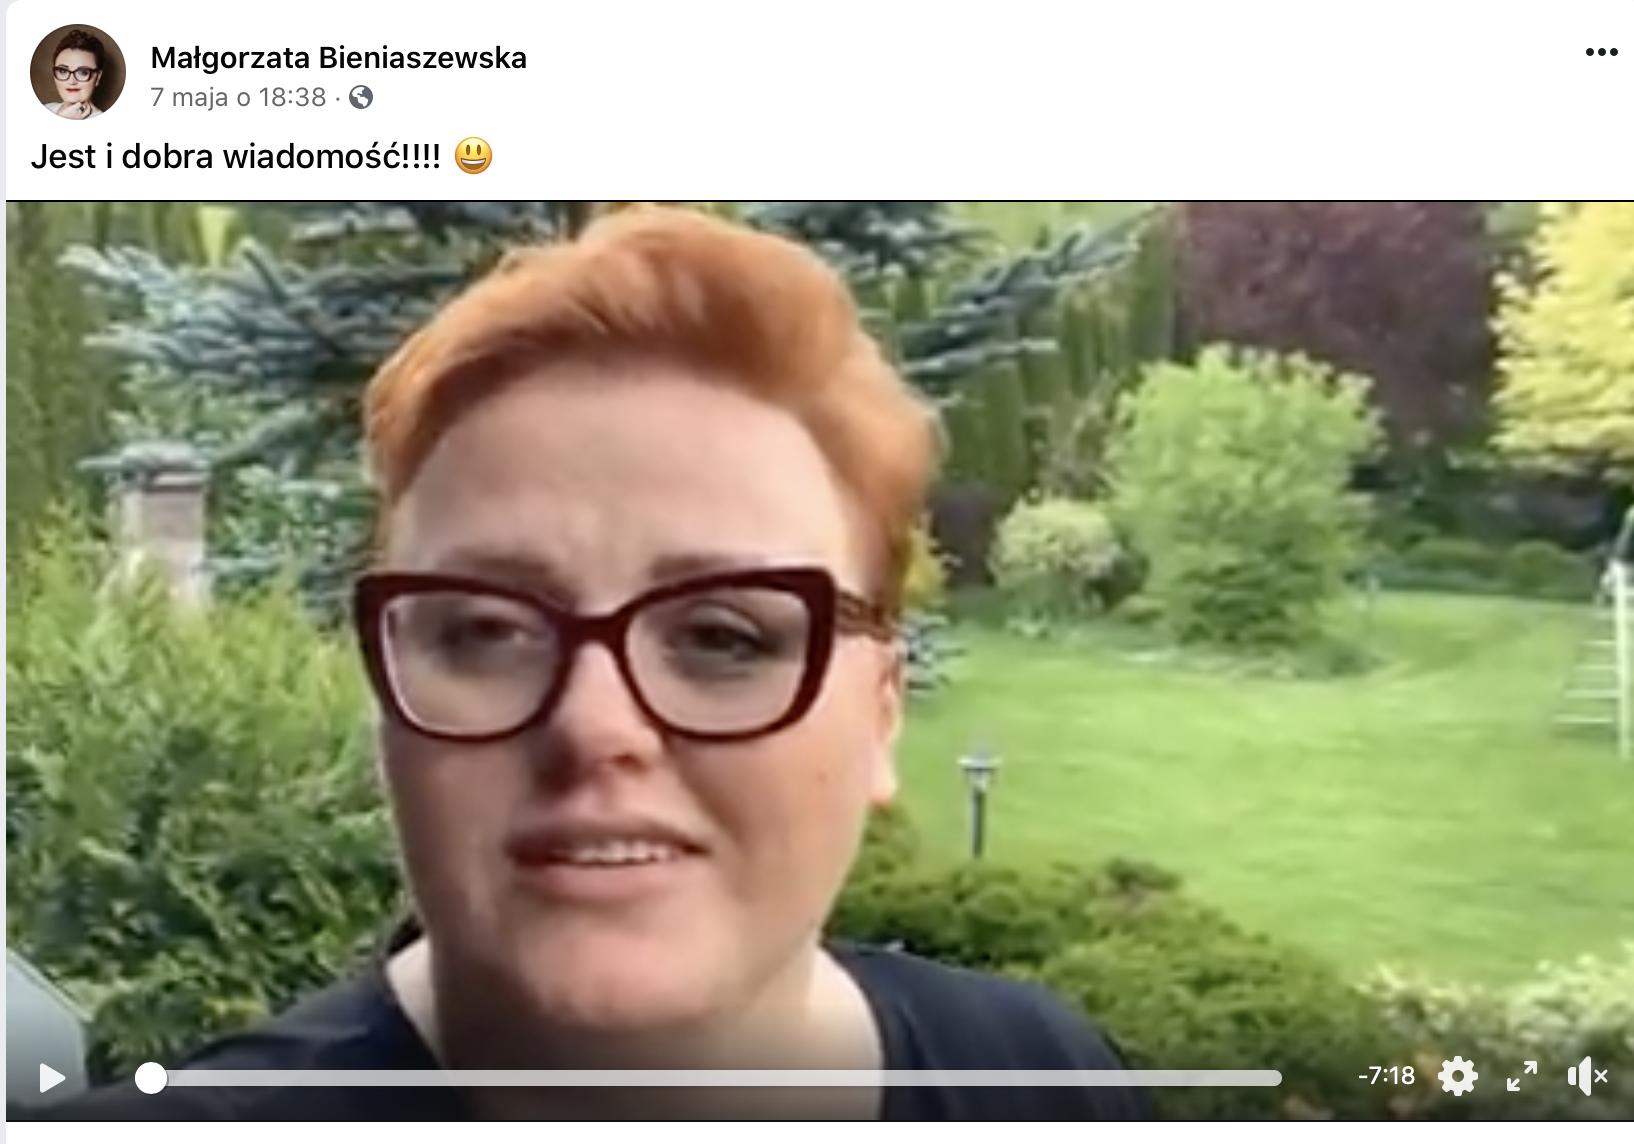 Małgorzata Bieniaszewska Facebook